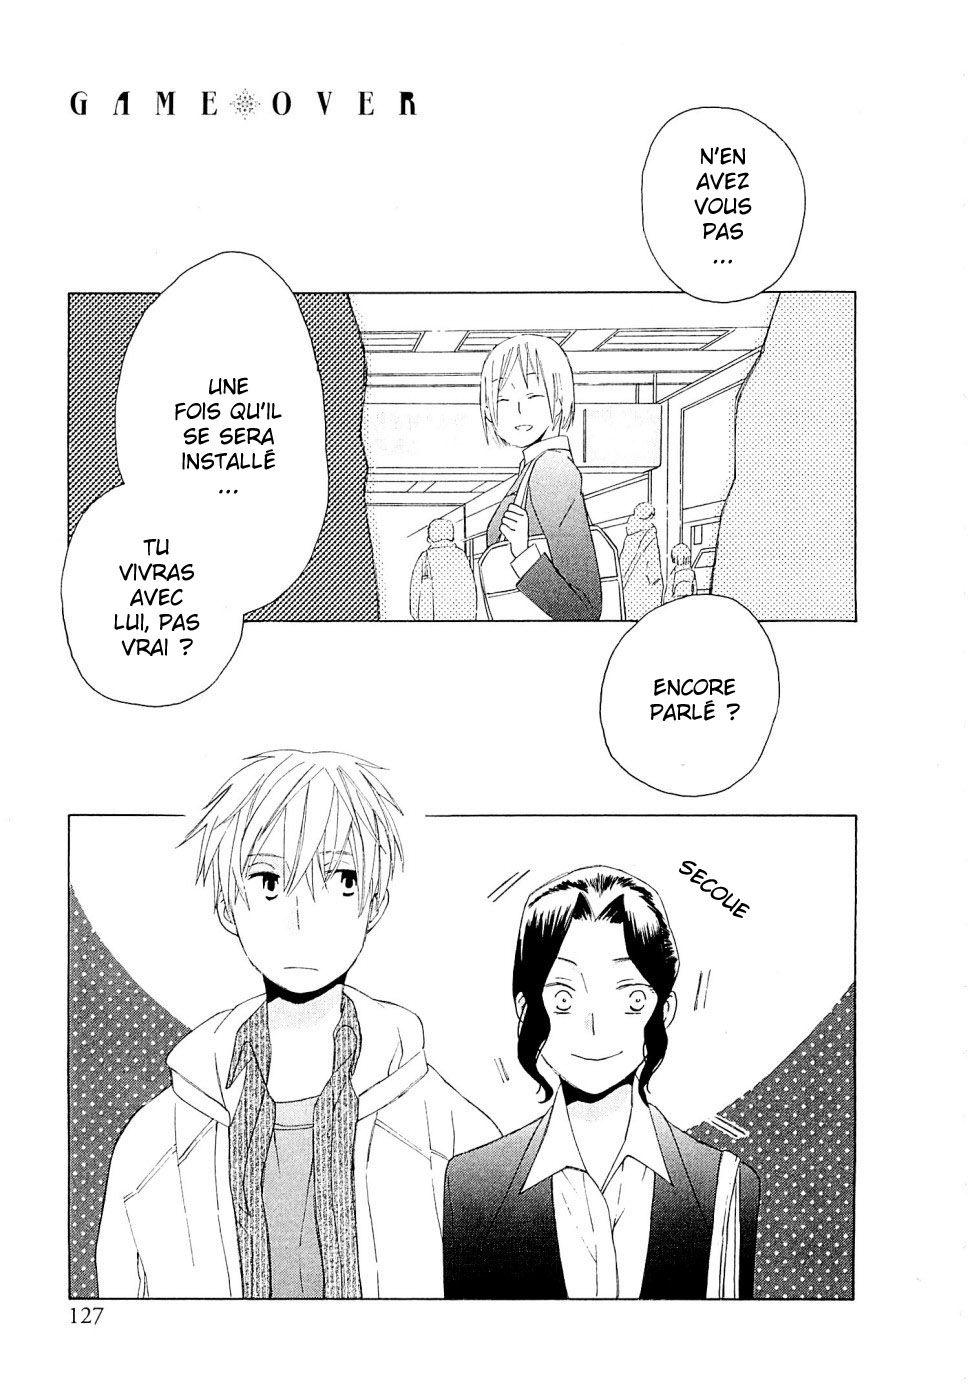 https://nine.mangadogs.com/fr_manga/pic1/8/968/44747/GameOver7VF_0_59.jpg Page 1